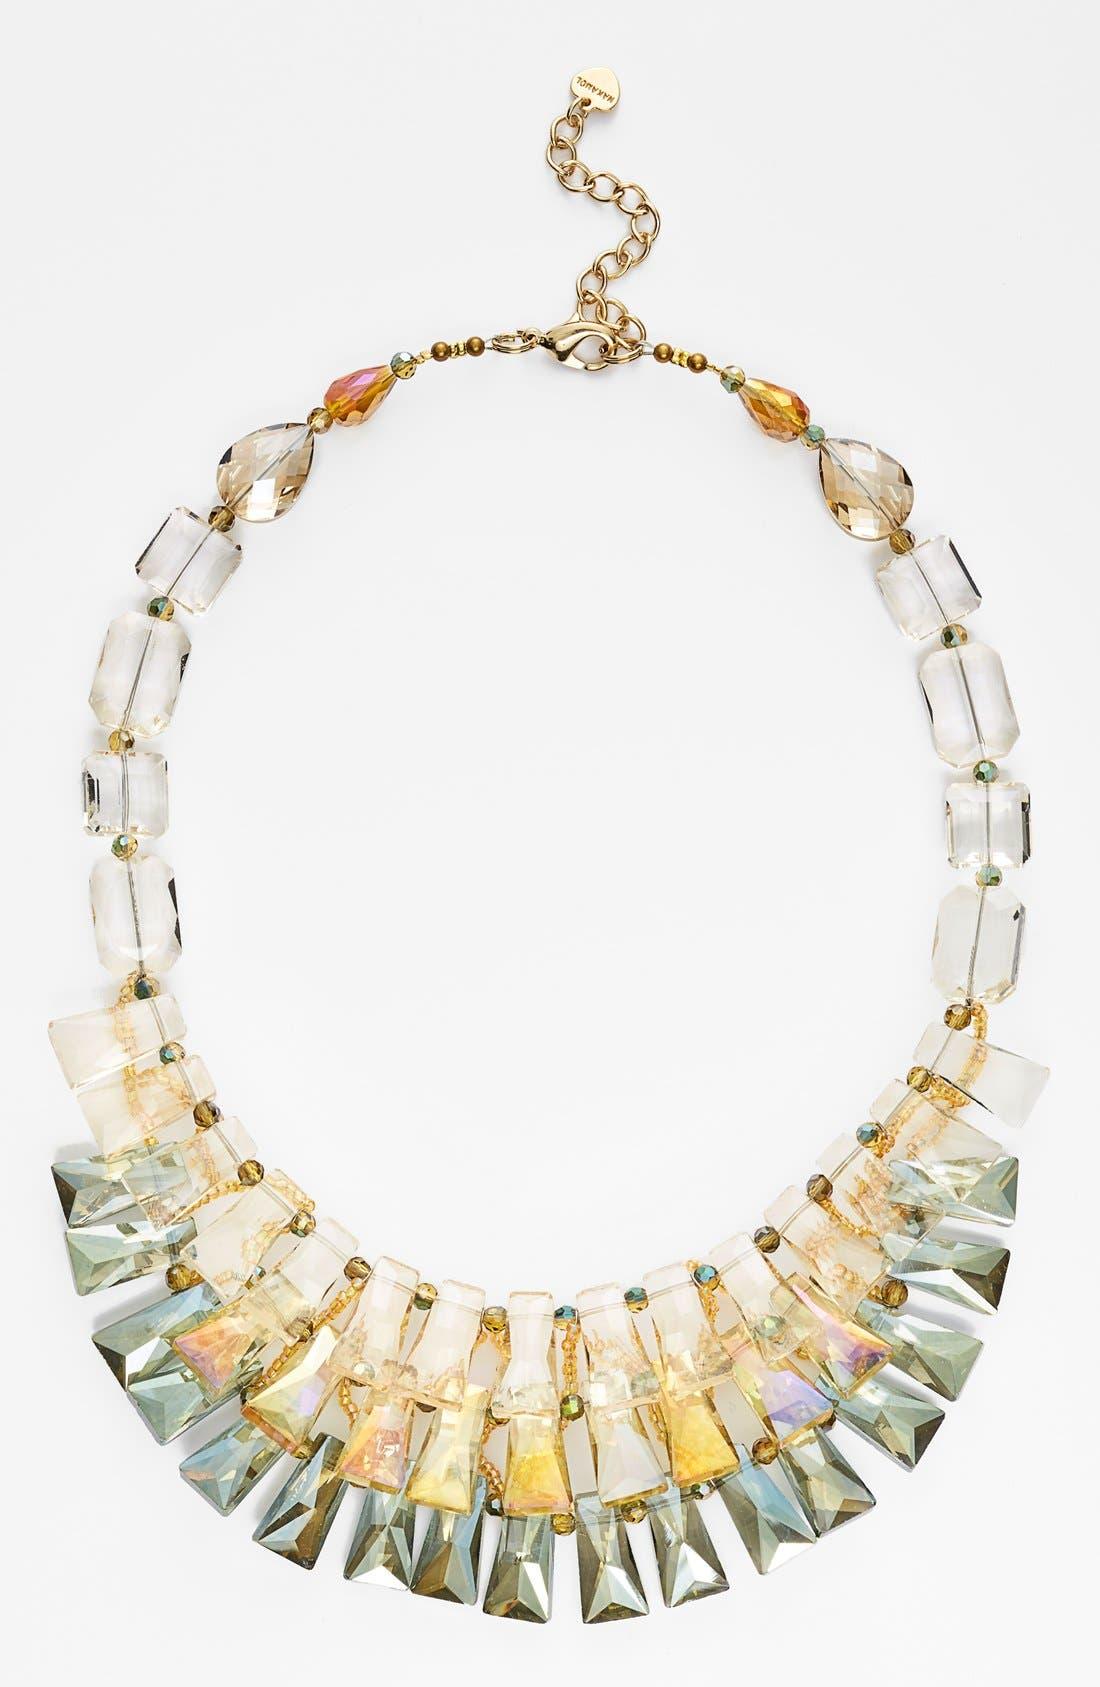 Alternate Image 1 Selected - Nakamol Design Tiered Crystal Bib Necklace